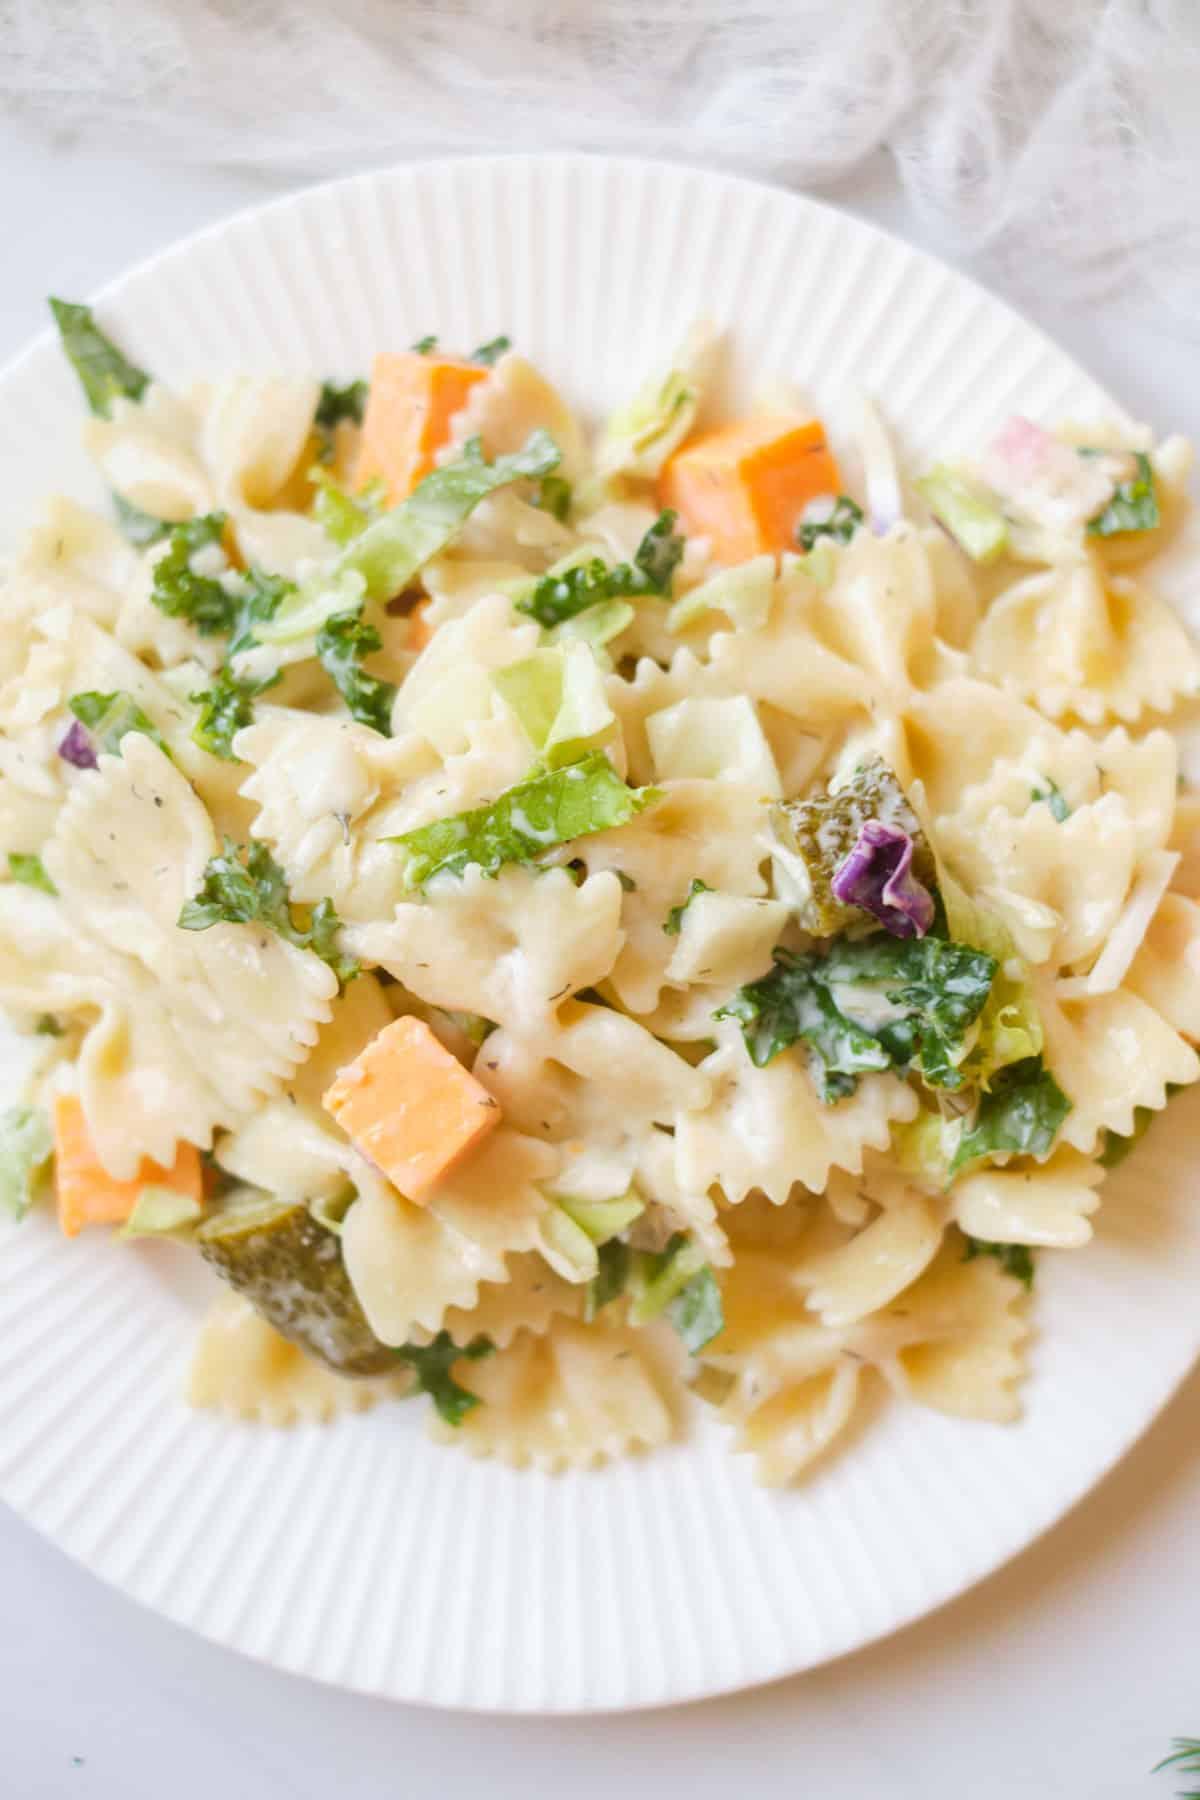 Plate of pasta salad.